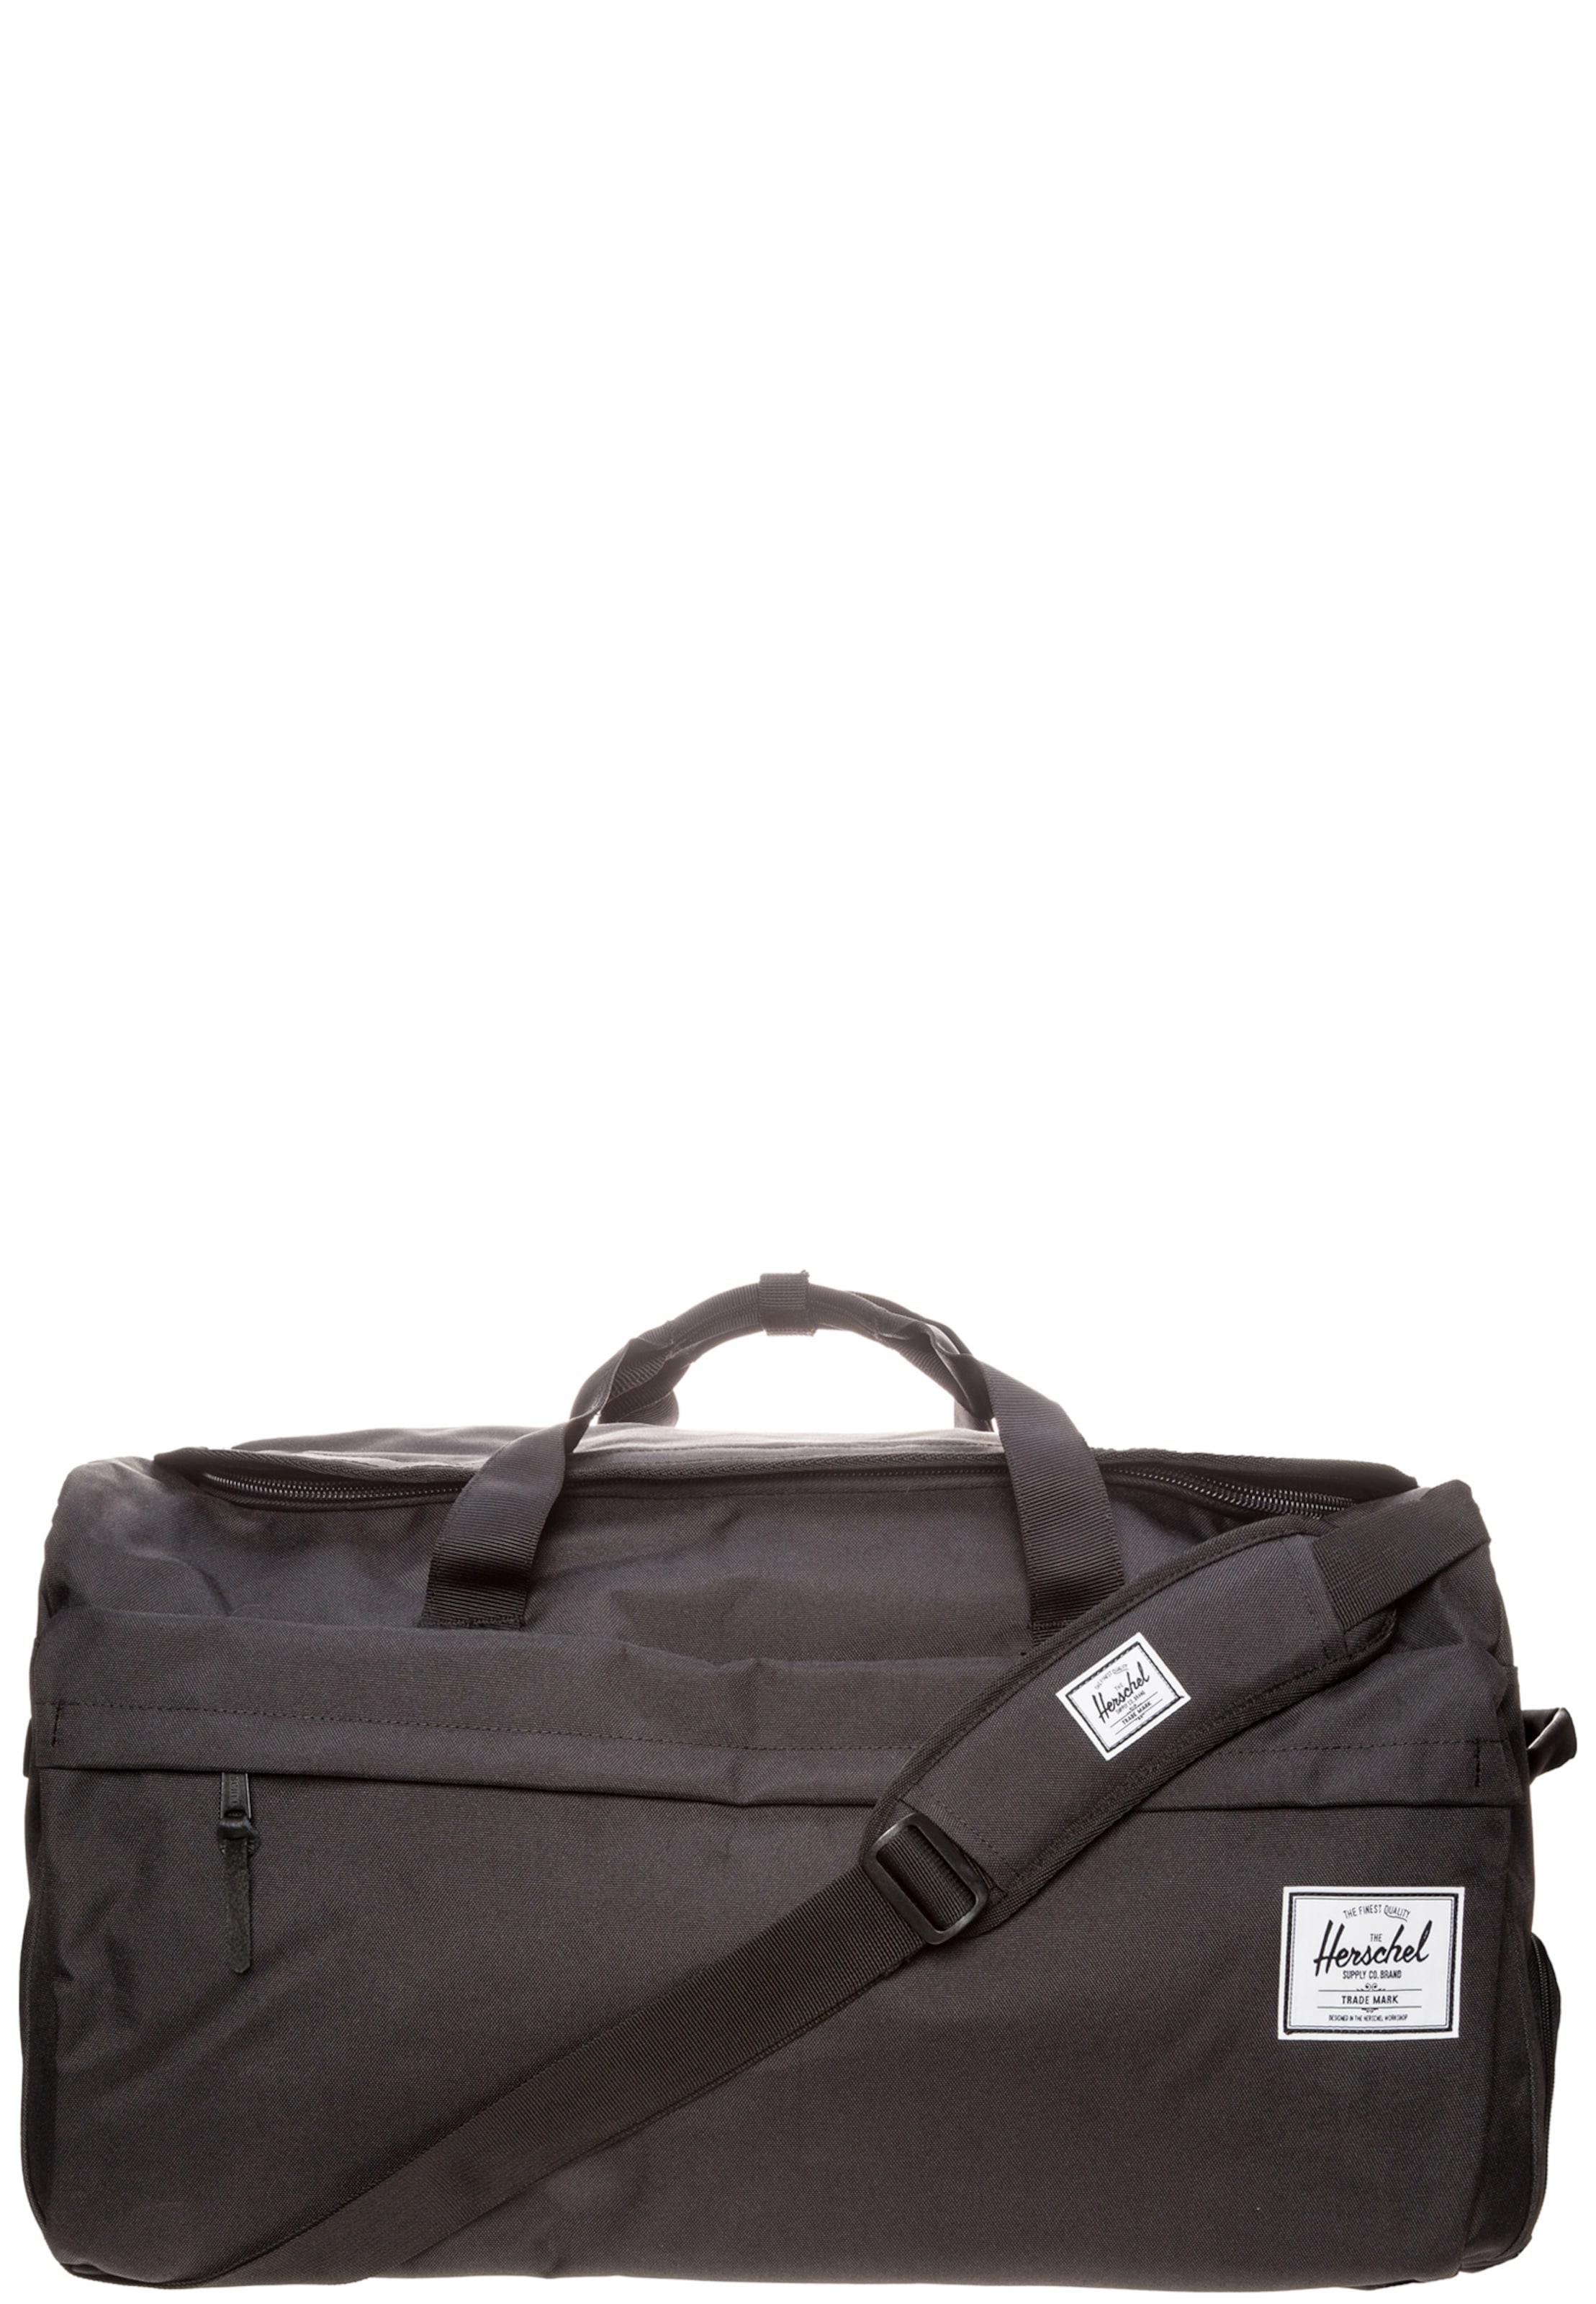 Herschel Outfitter Tasche Rabatt Günstig Online menGUP